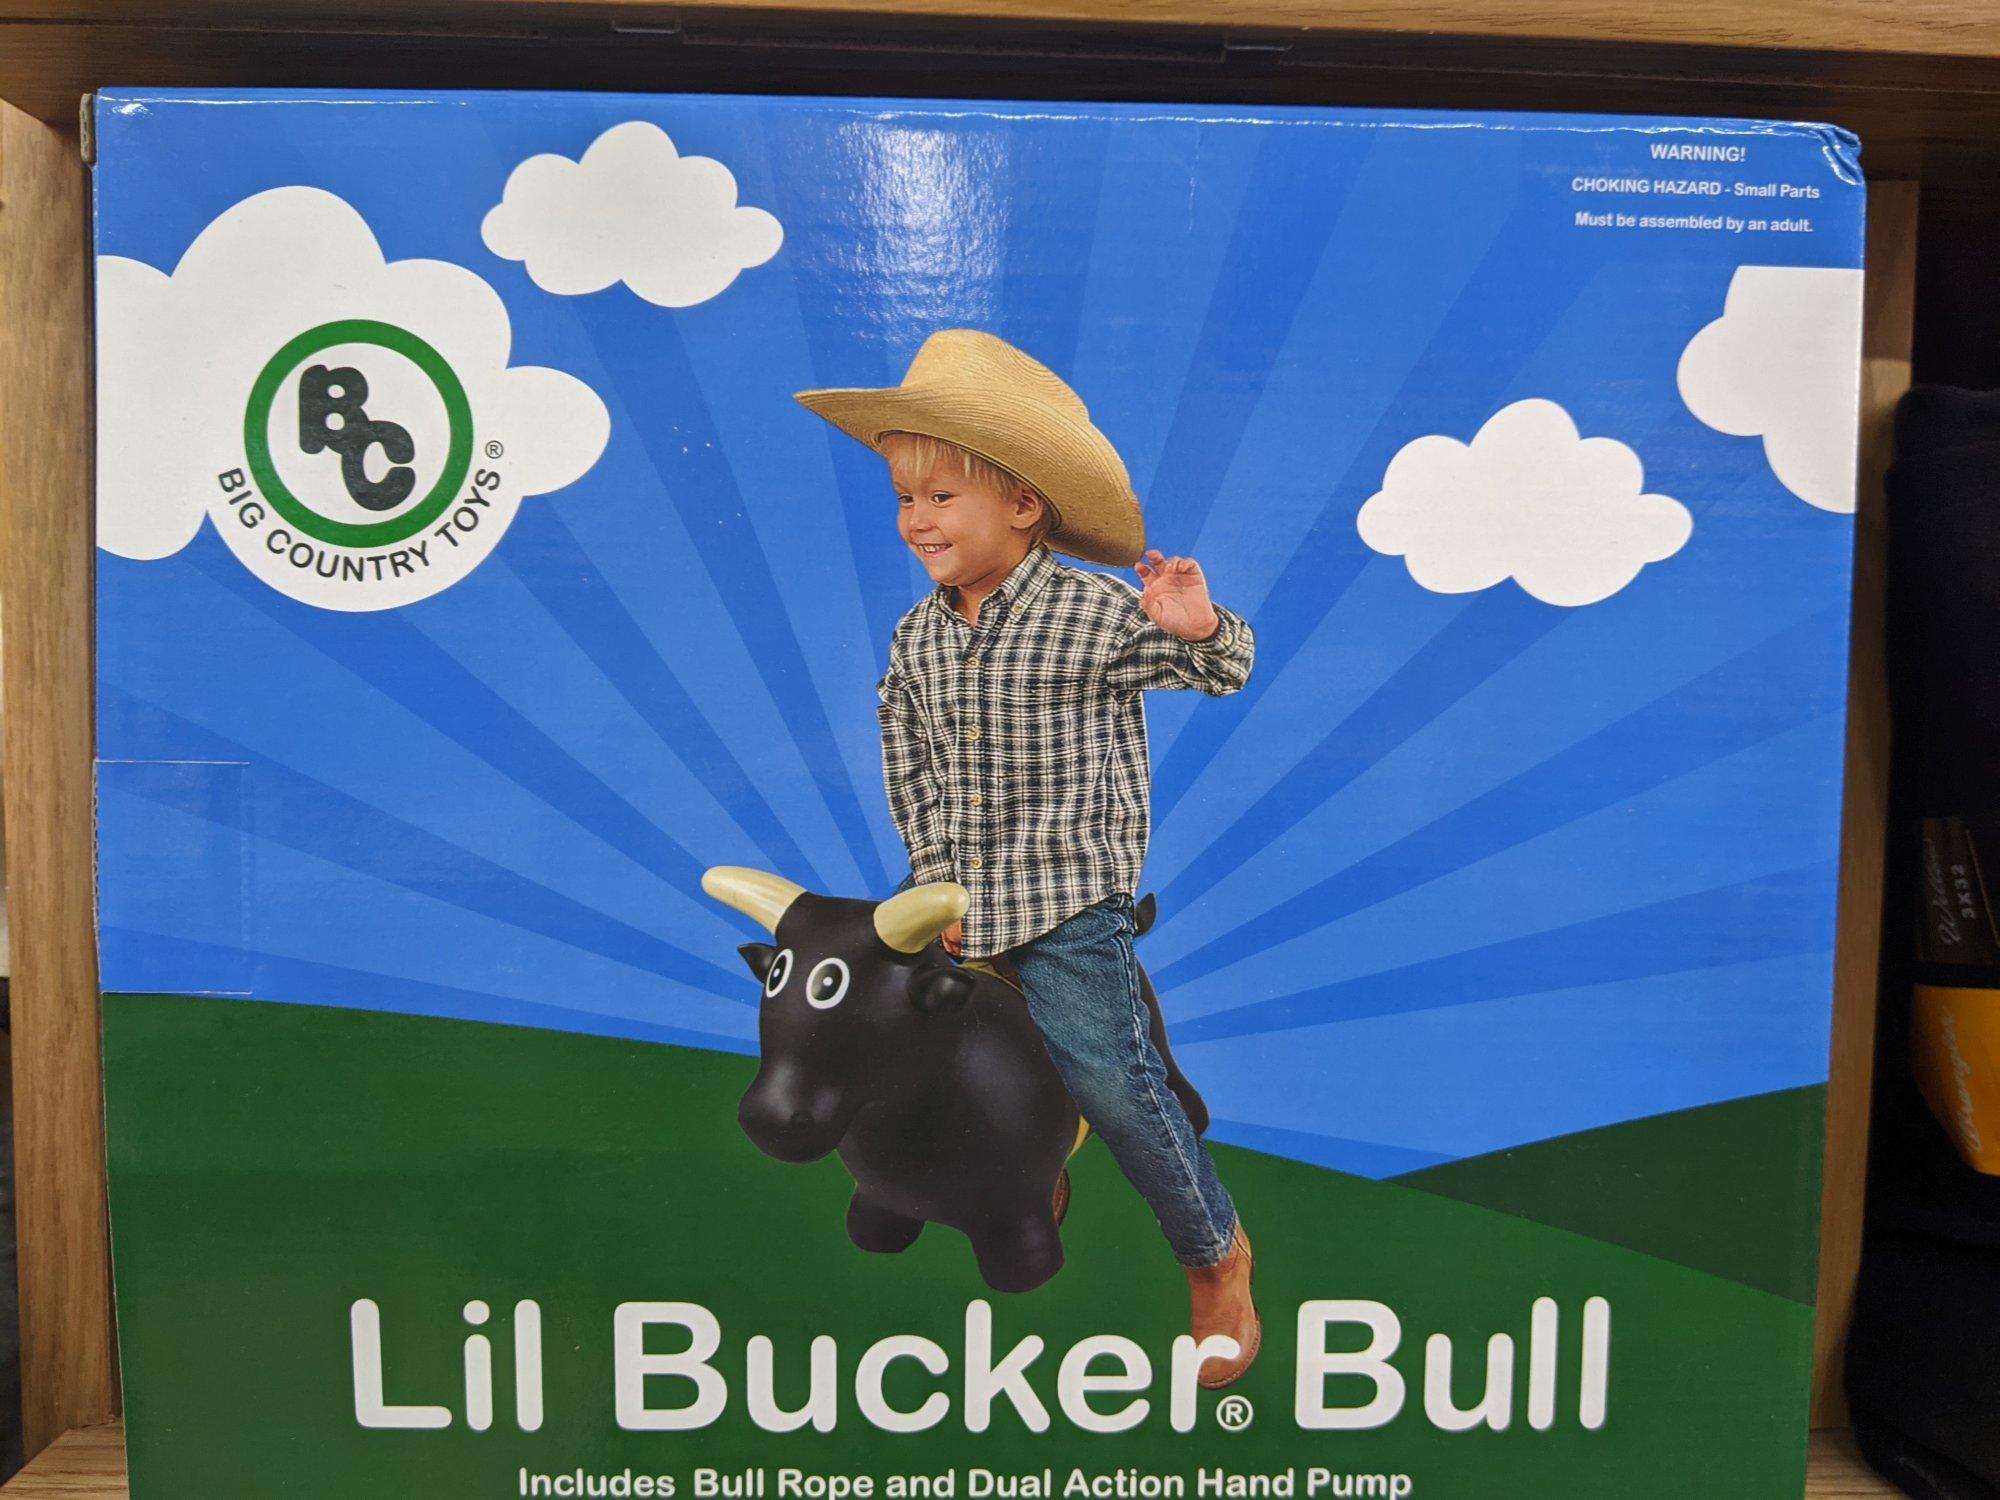 Big Country Toy Lil Bucker Bull